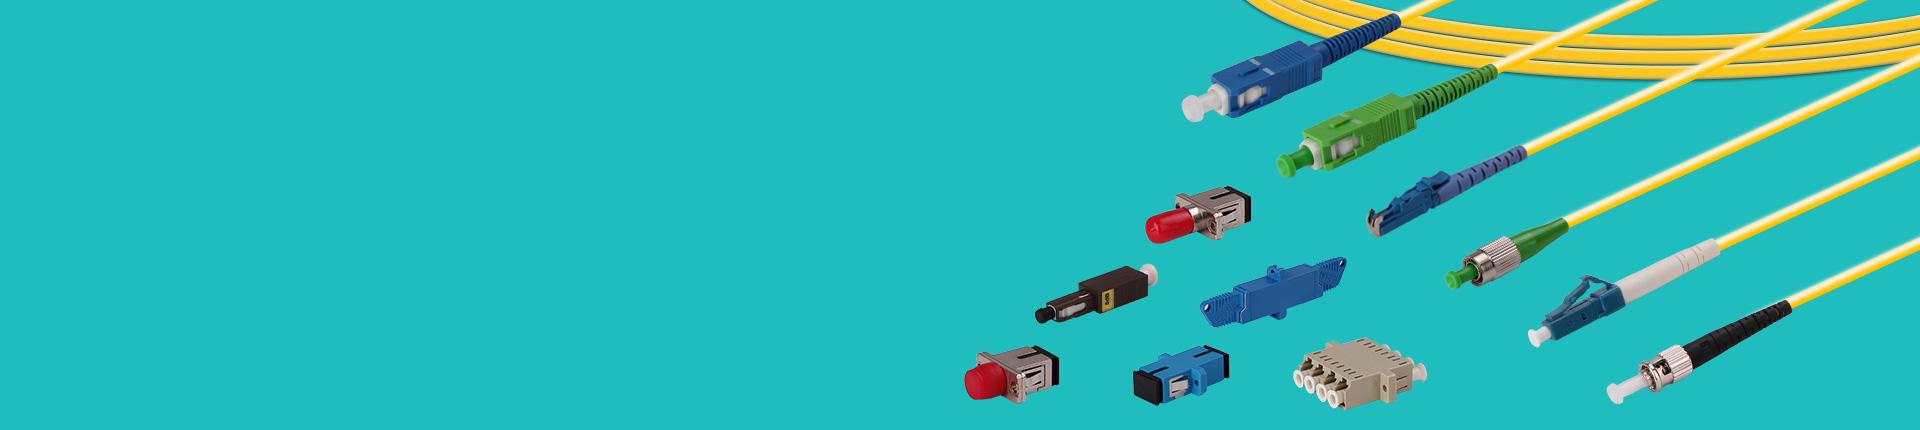 fiber_optic_interconnection_new_banner